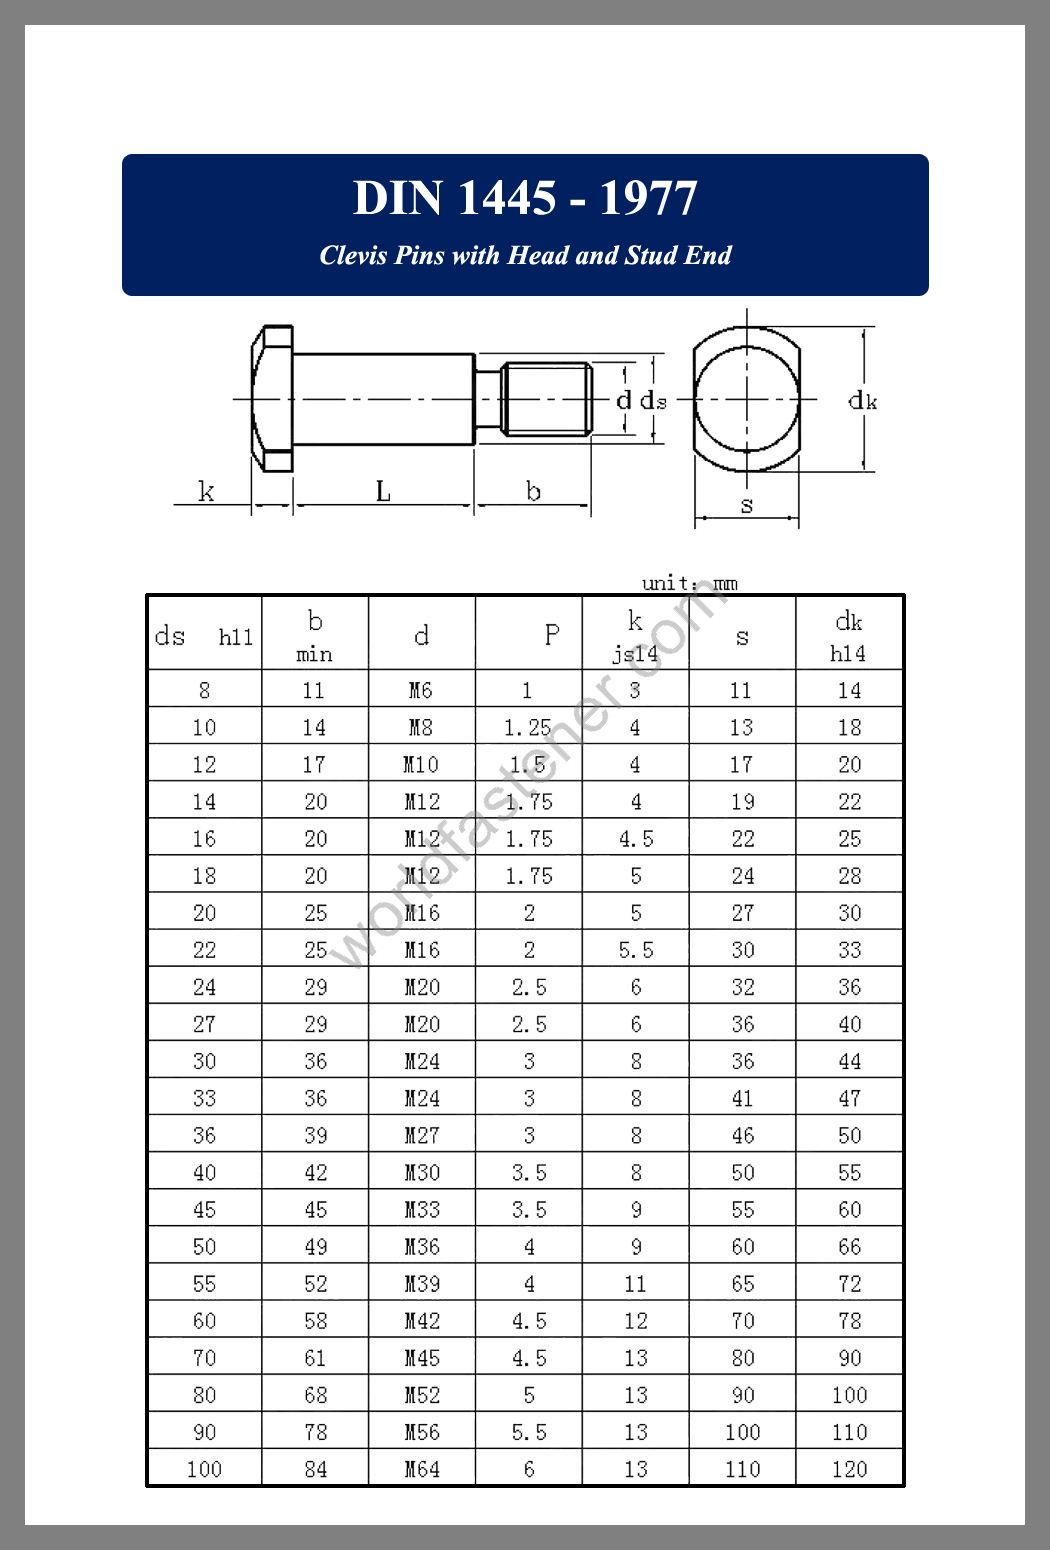 DIN 1445, DIN 1445 Clevis Pins, fastener, screw, bolt